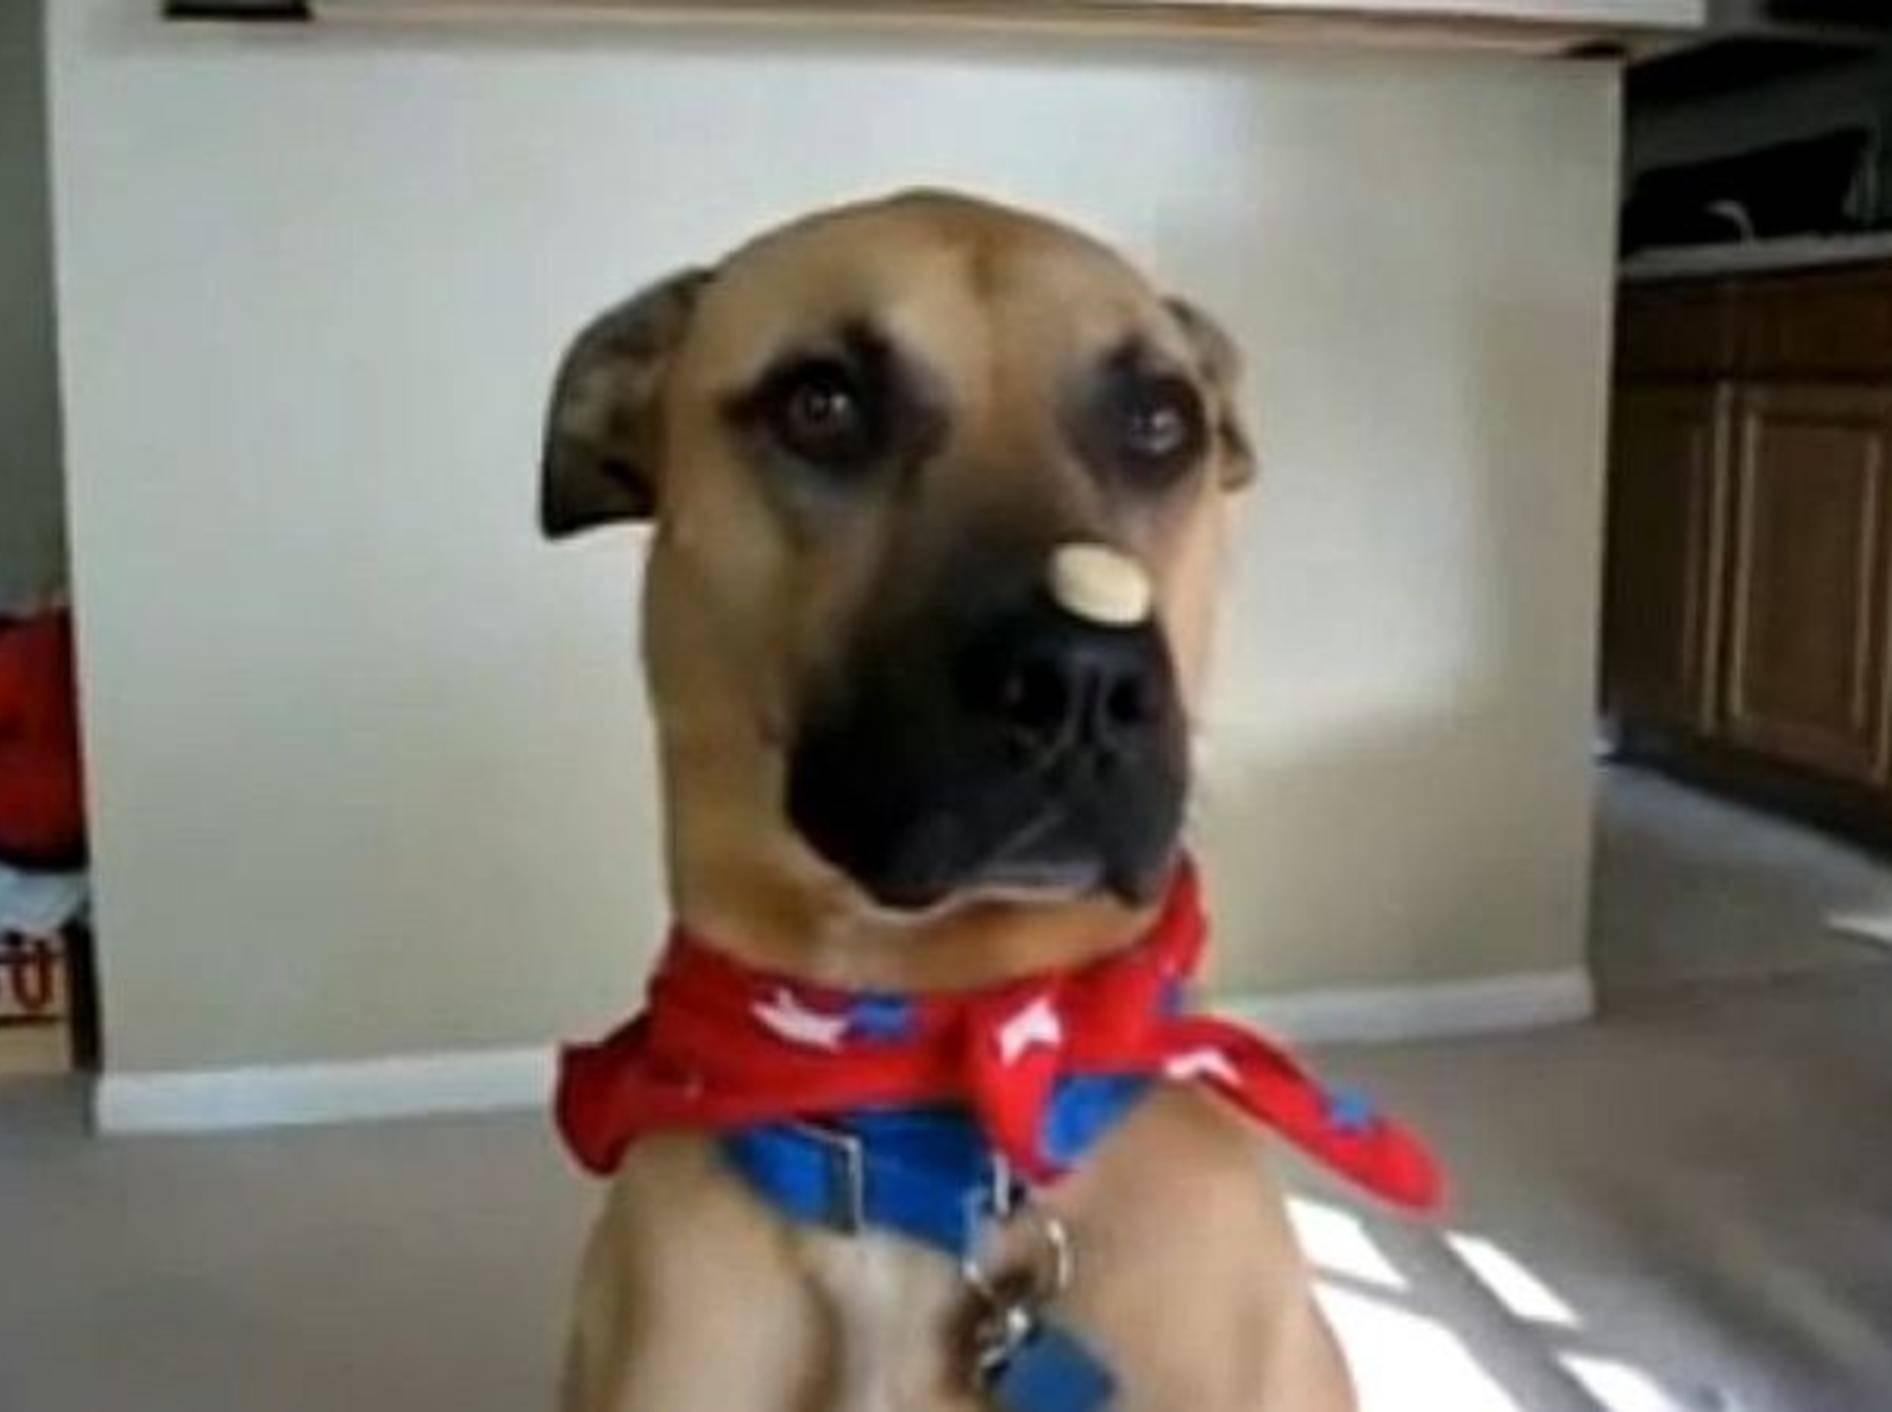 Hund zeigt Zaubertrick – Bild: Youtube / FashionWorld2013